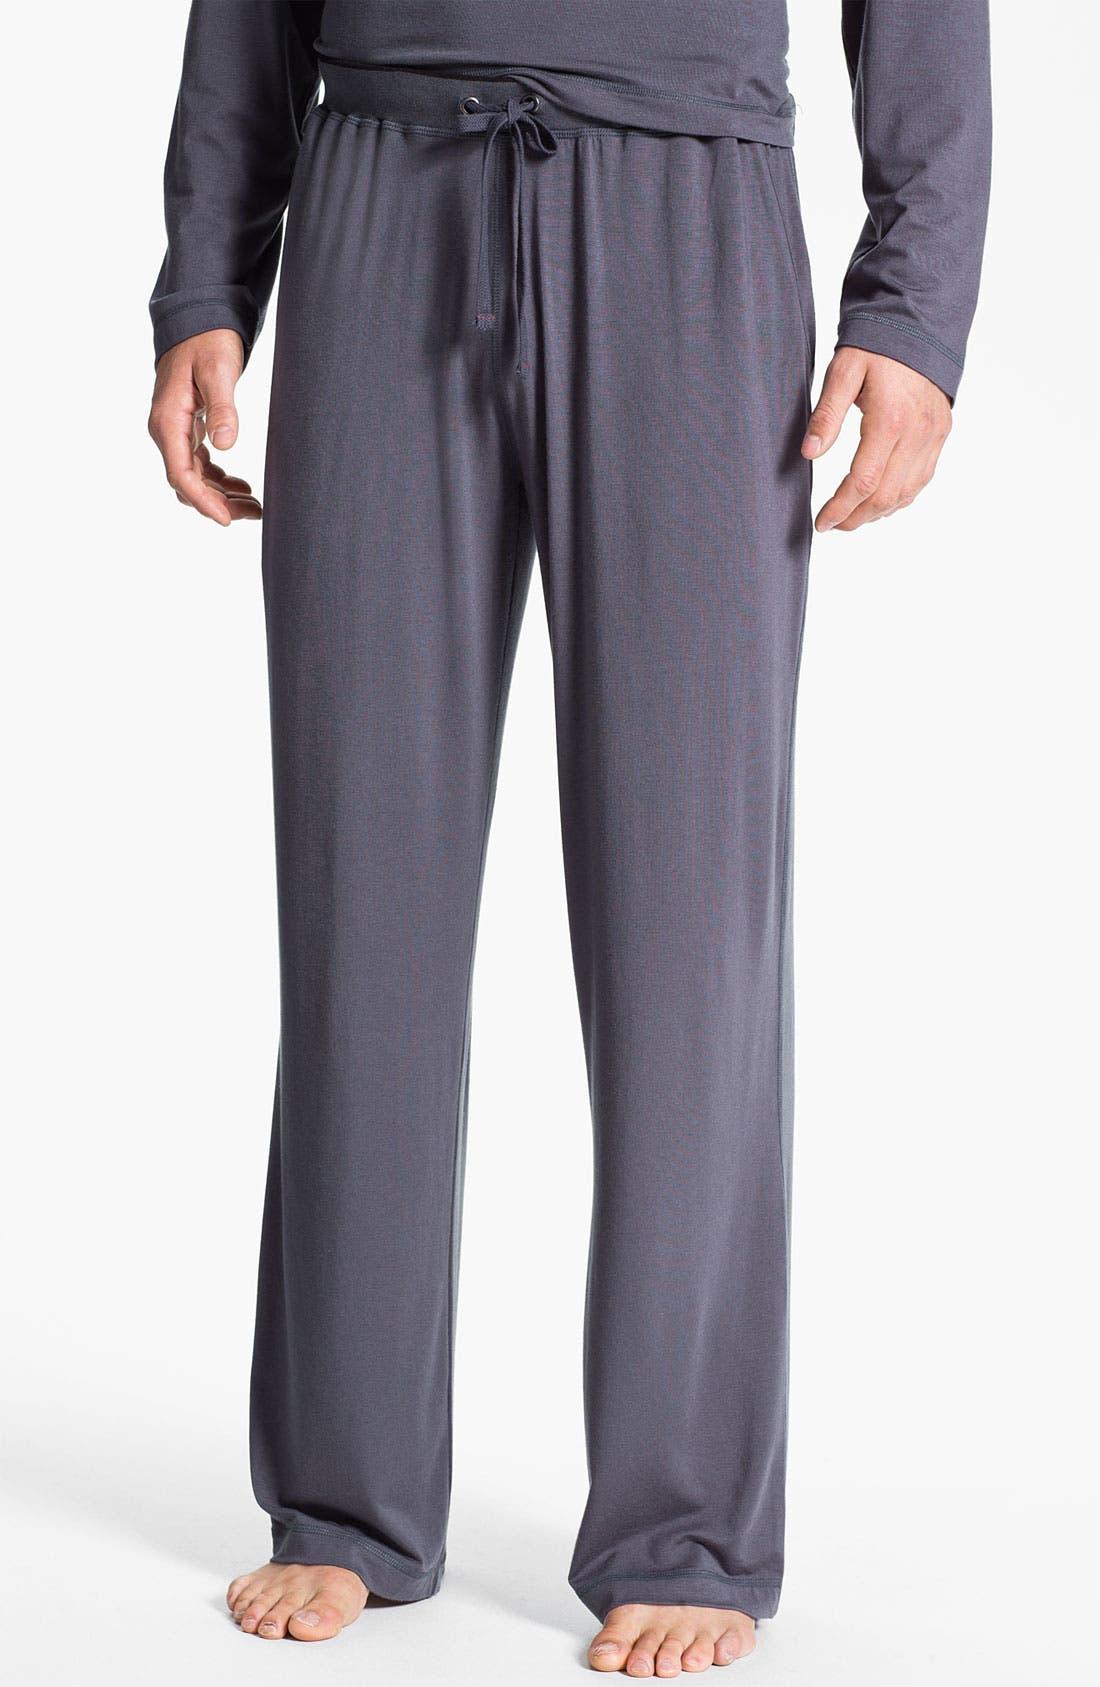 Main Image - Daniel Buchler Silk & Modal Lounge Pants